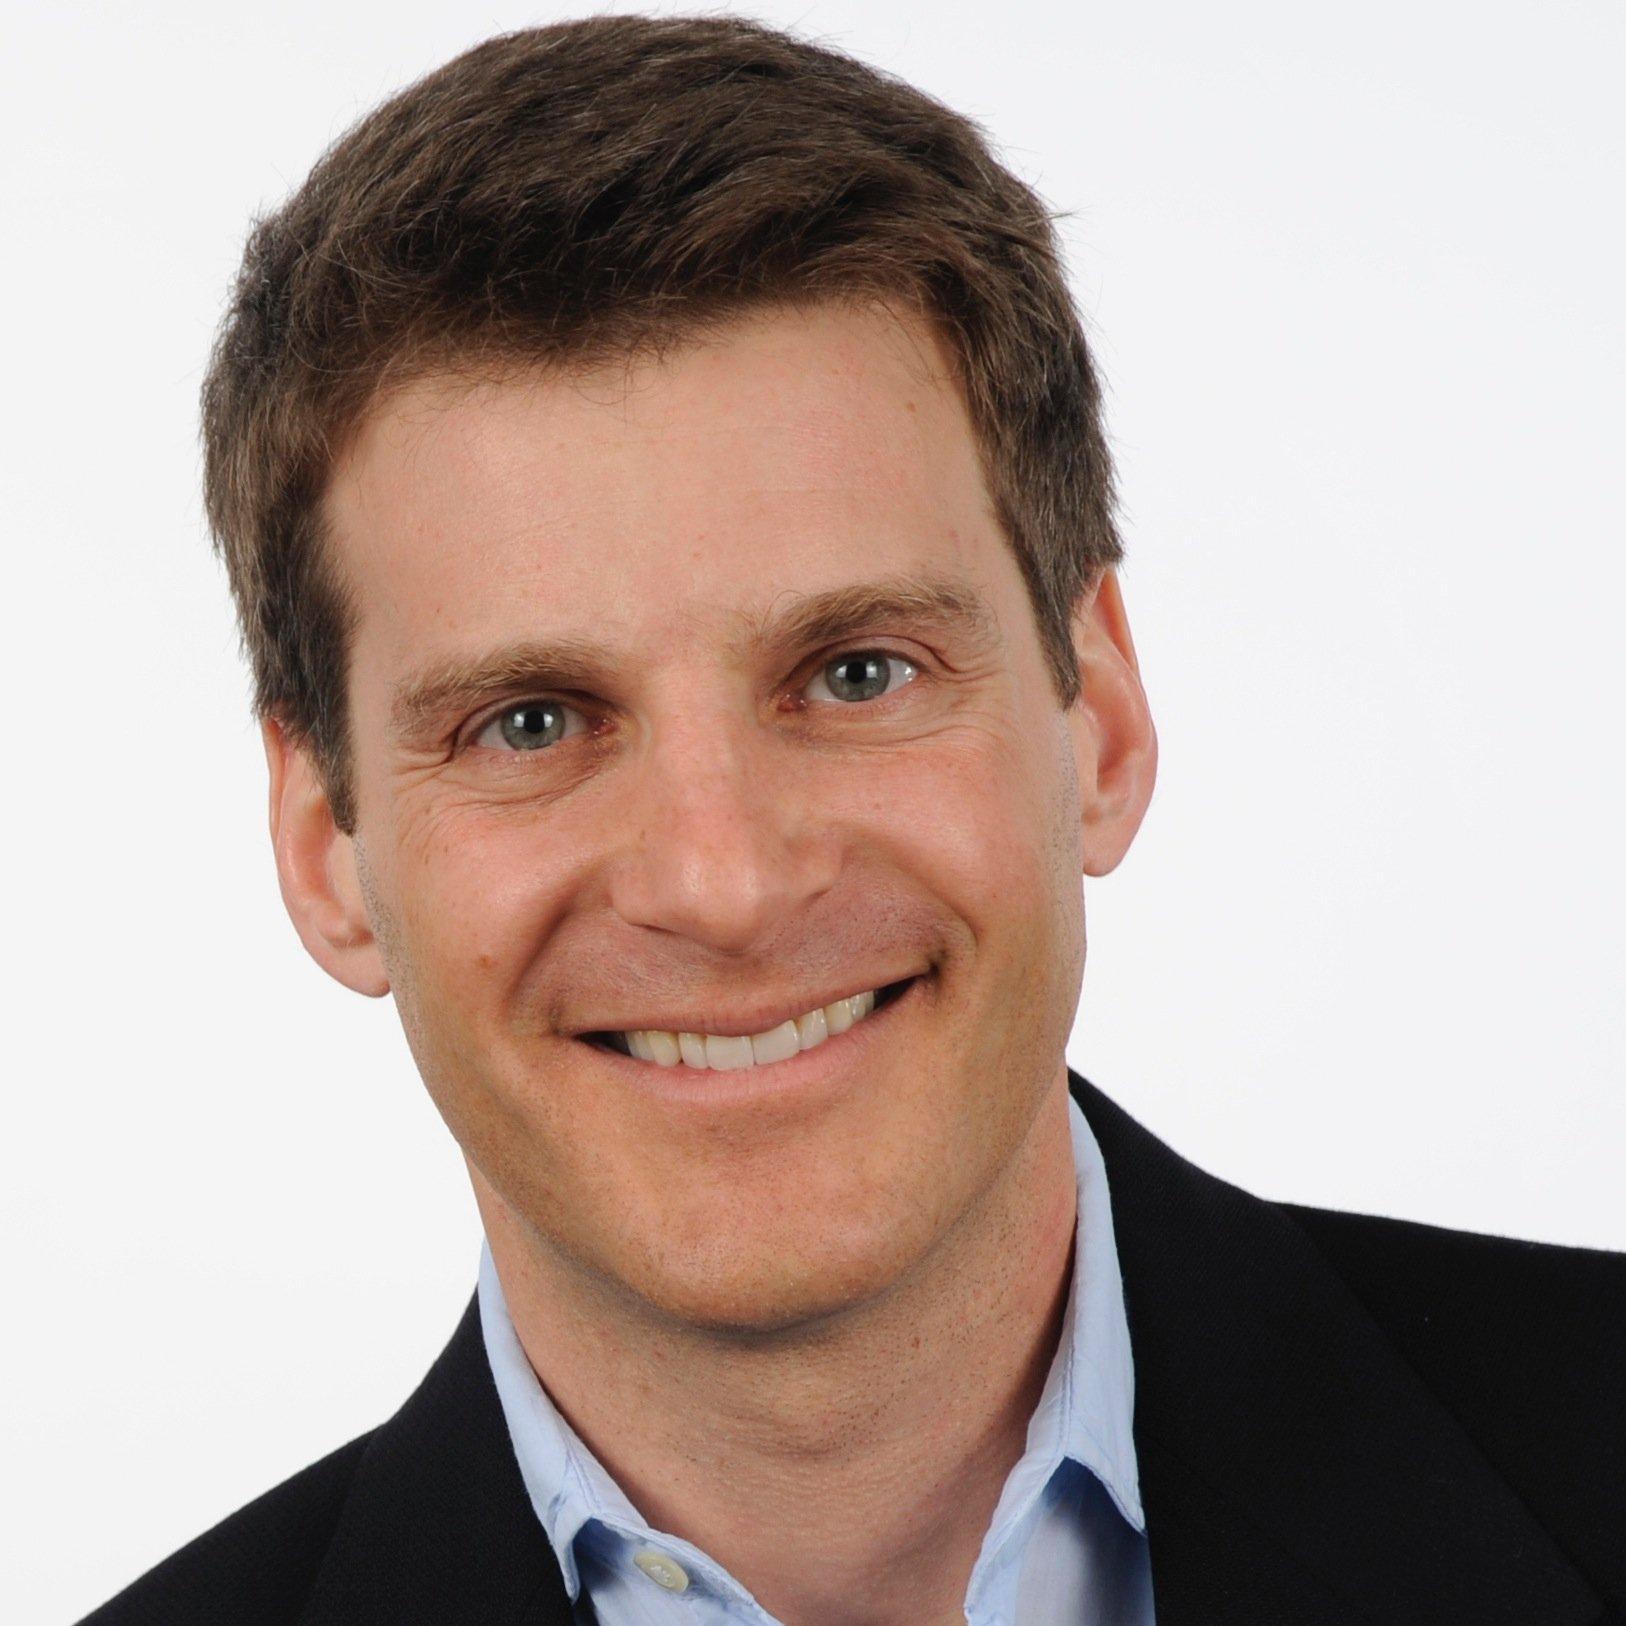 Peter Bregman Social Profile